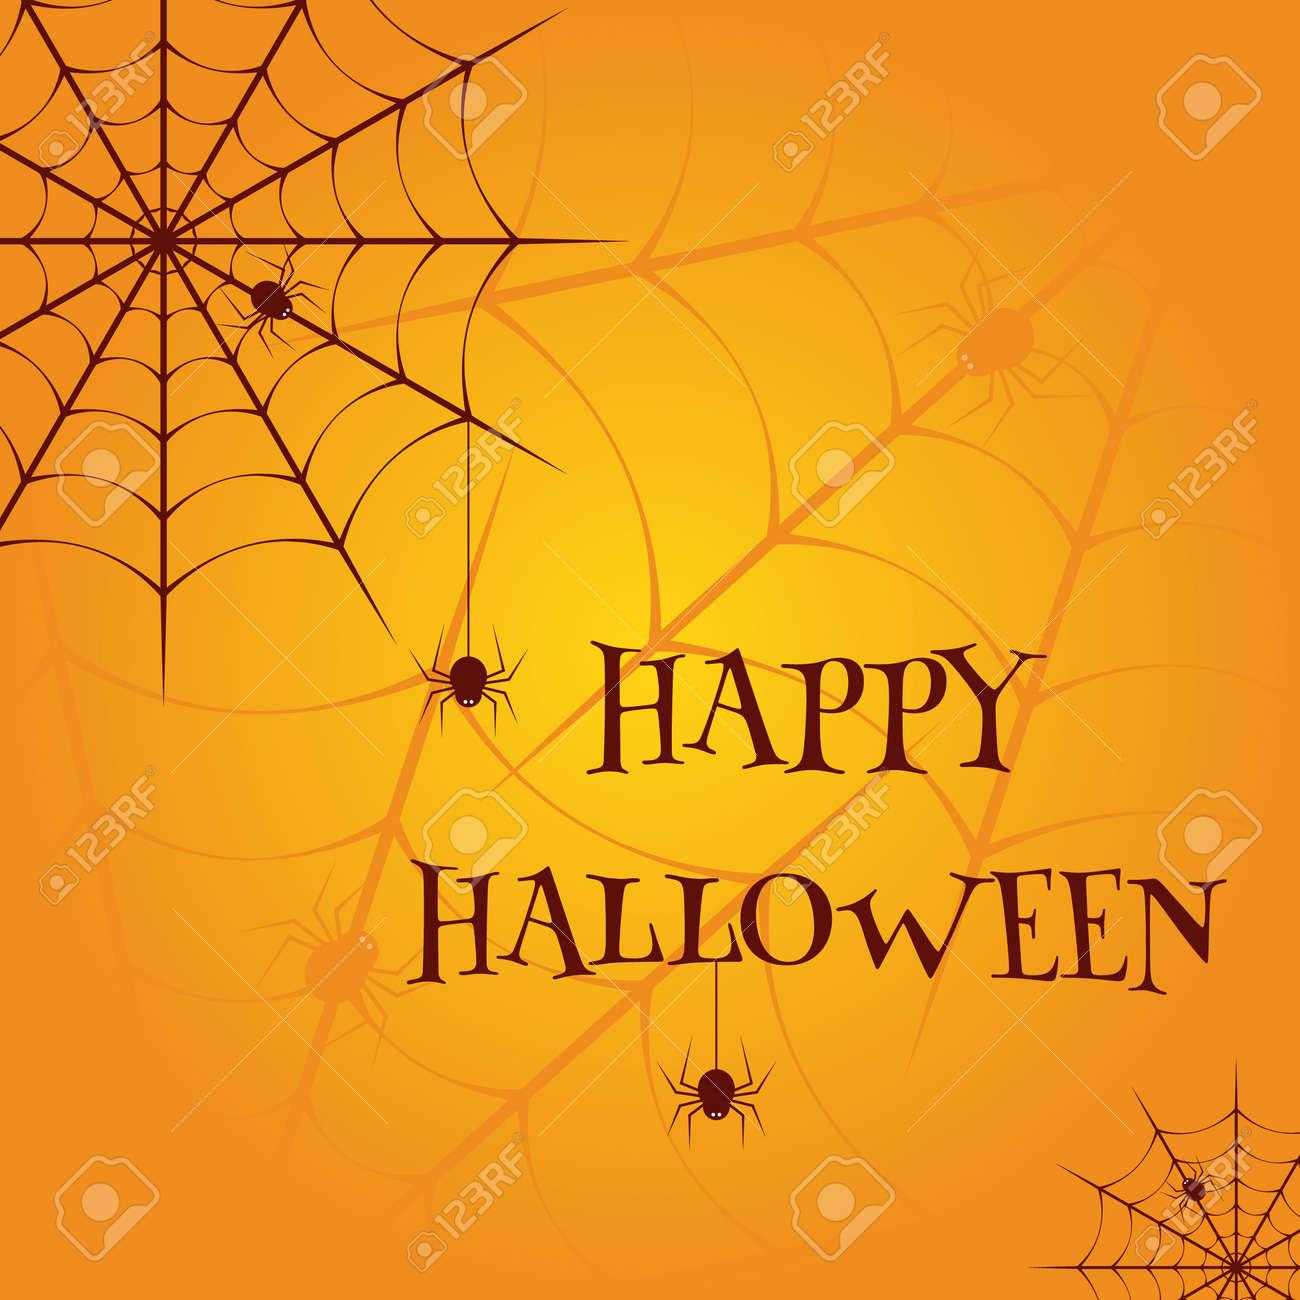 Happy Halloween Vector illustration template - 157378293